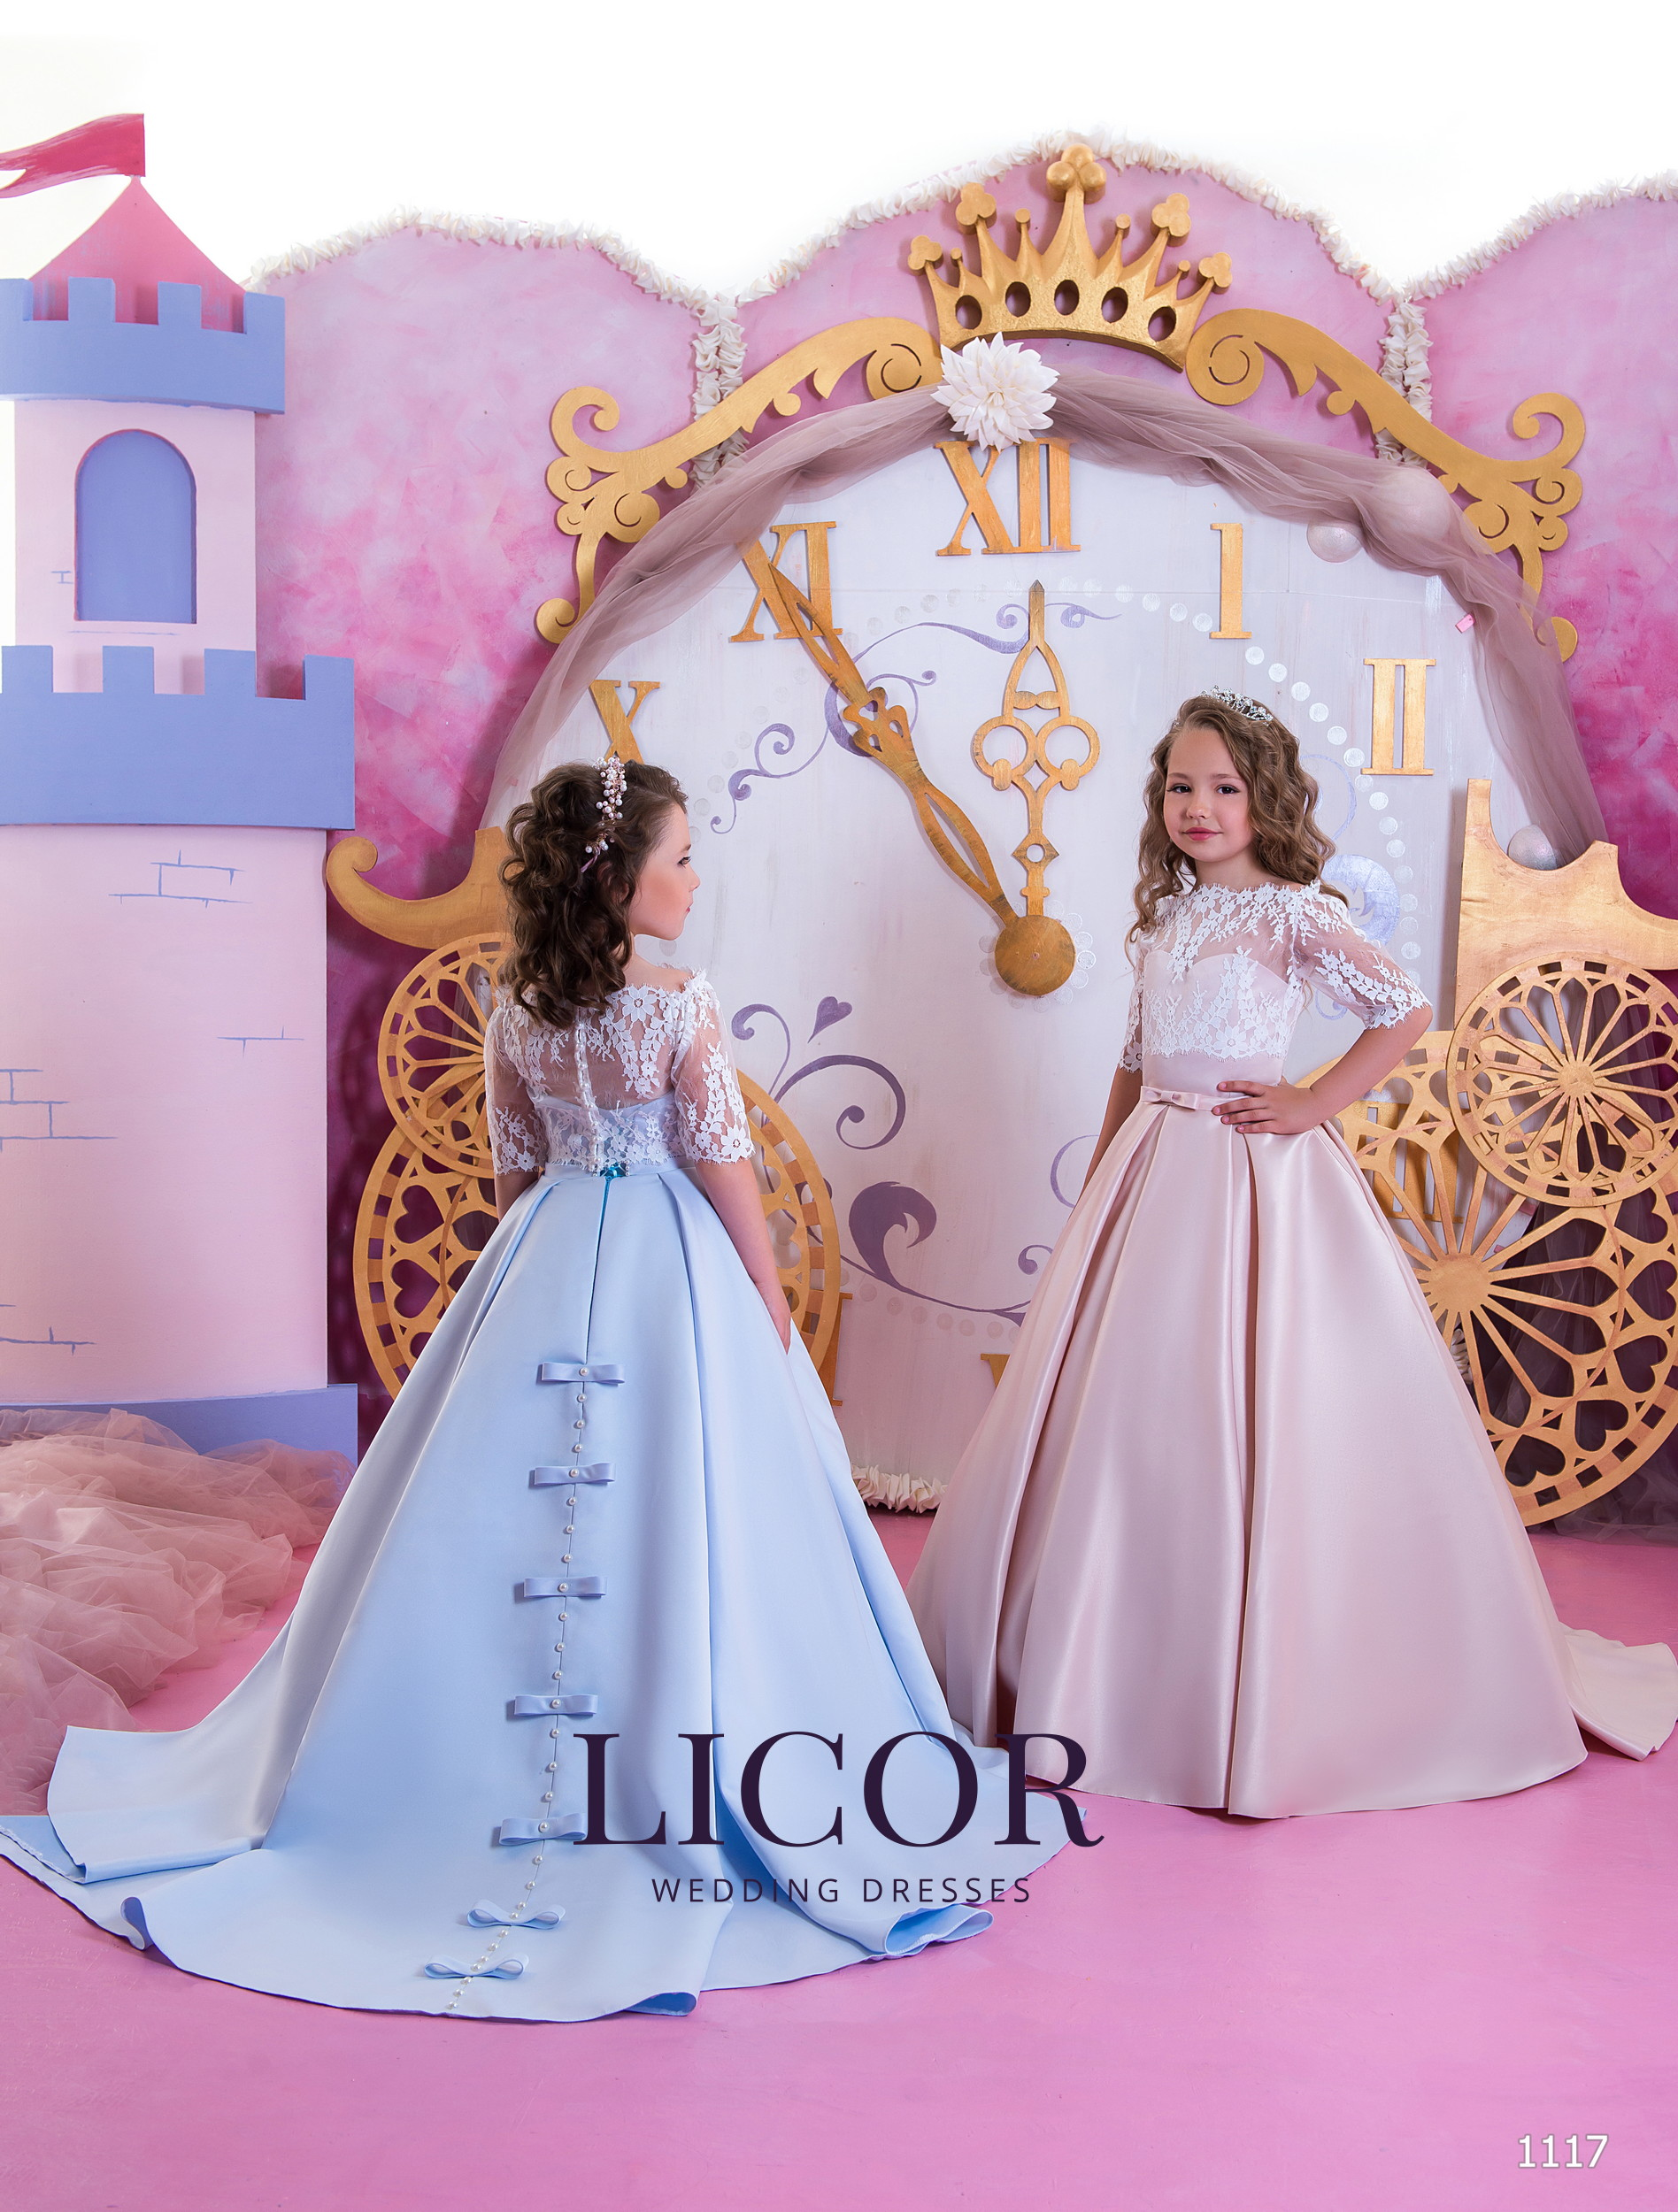 https://licor.com.ua/images/stories/virtuemart/product/1117(1).jpg